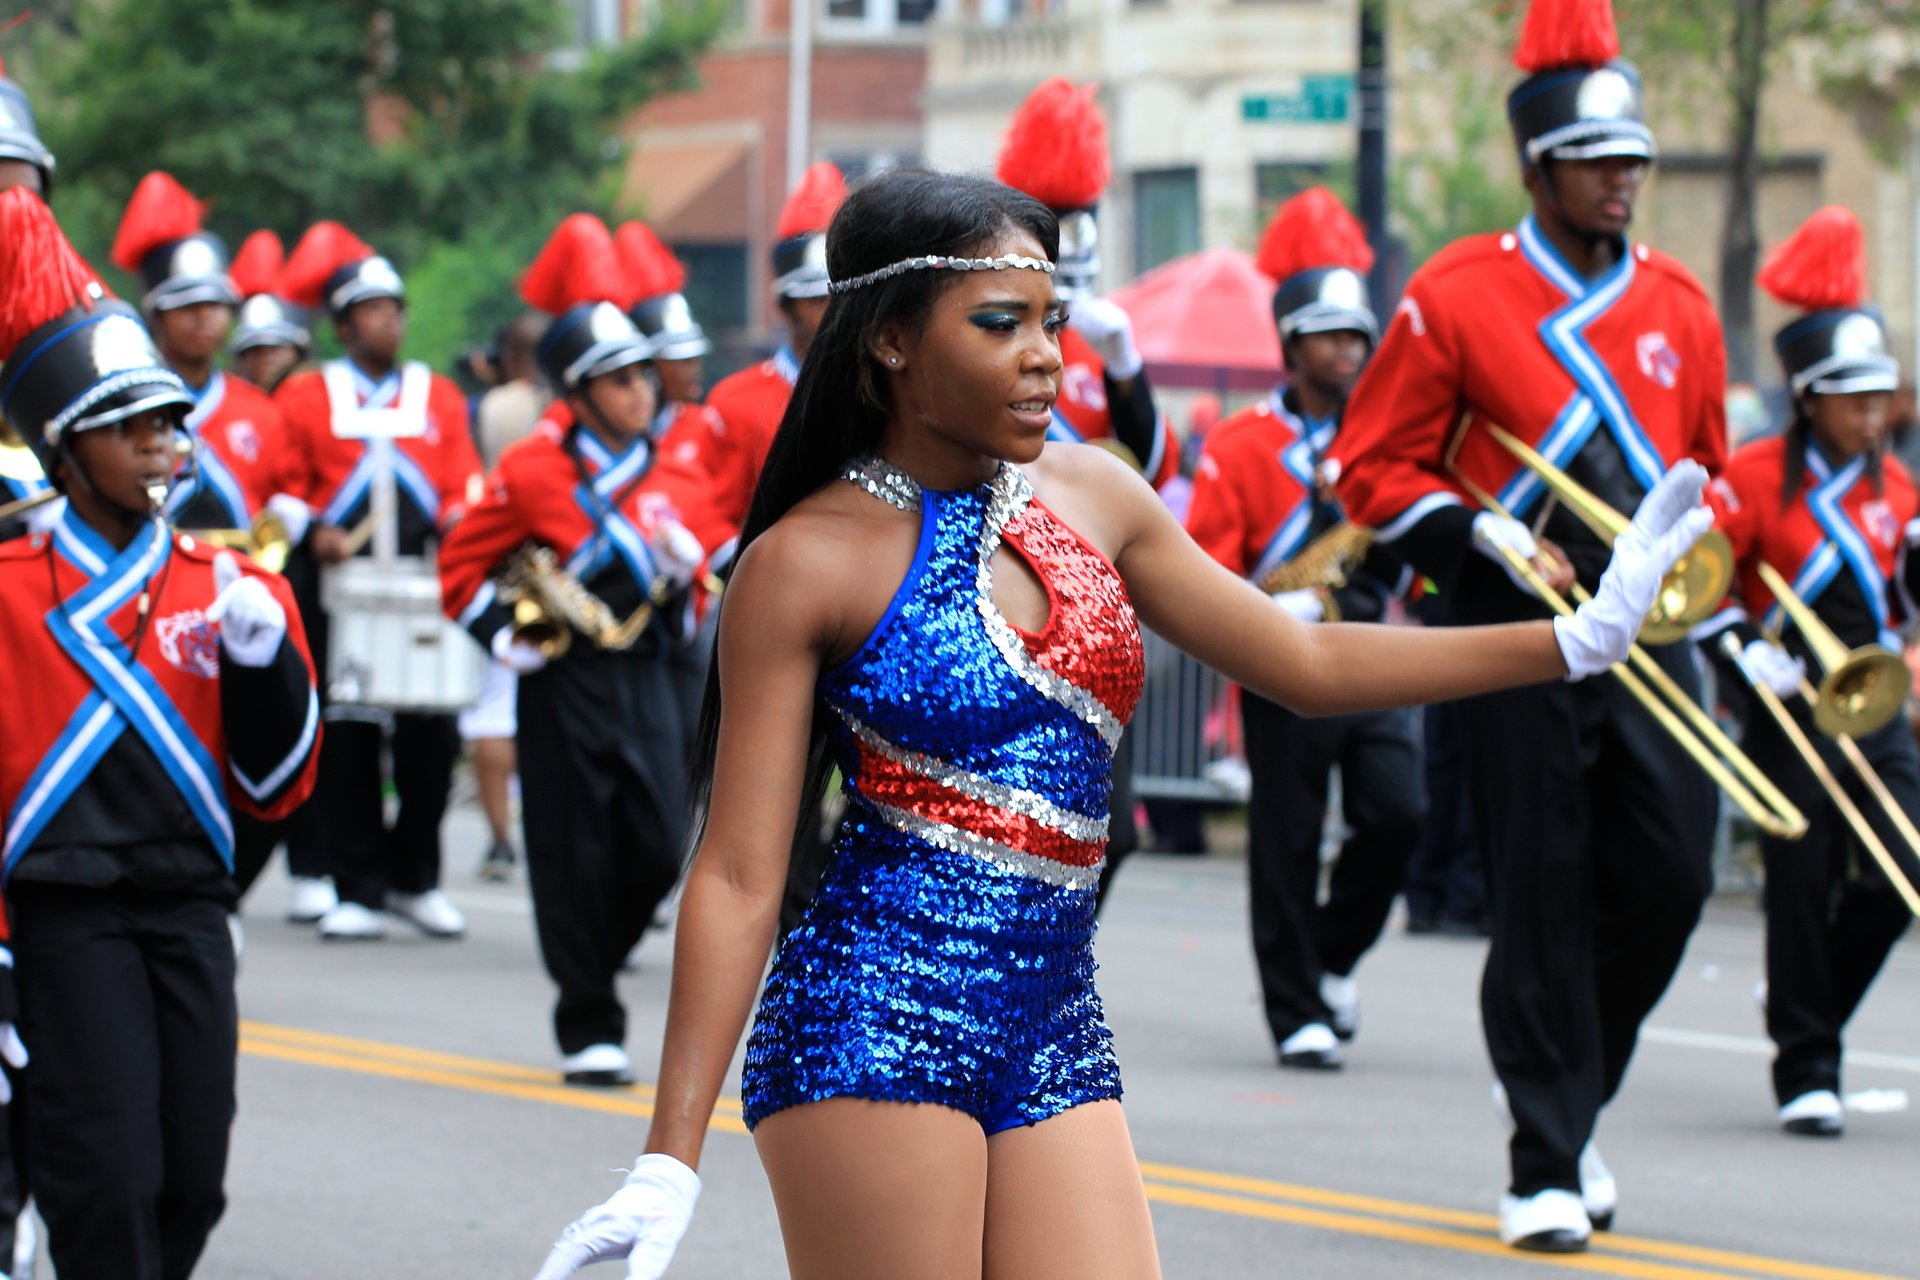 Bud Billiken Parade in Chicago 2020 - Best Time